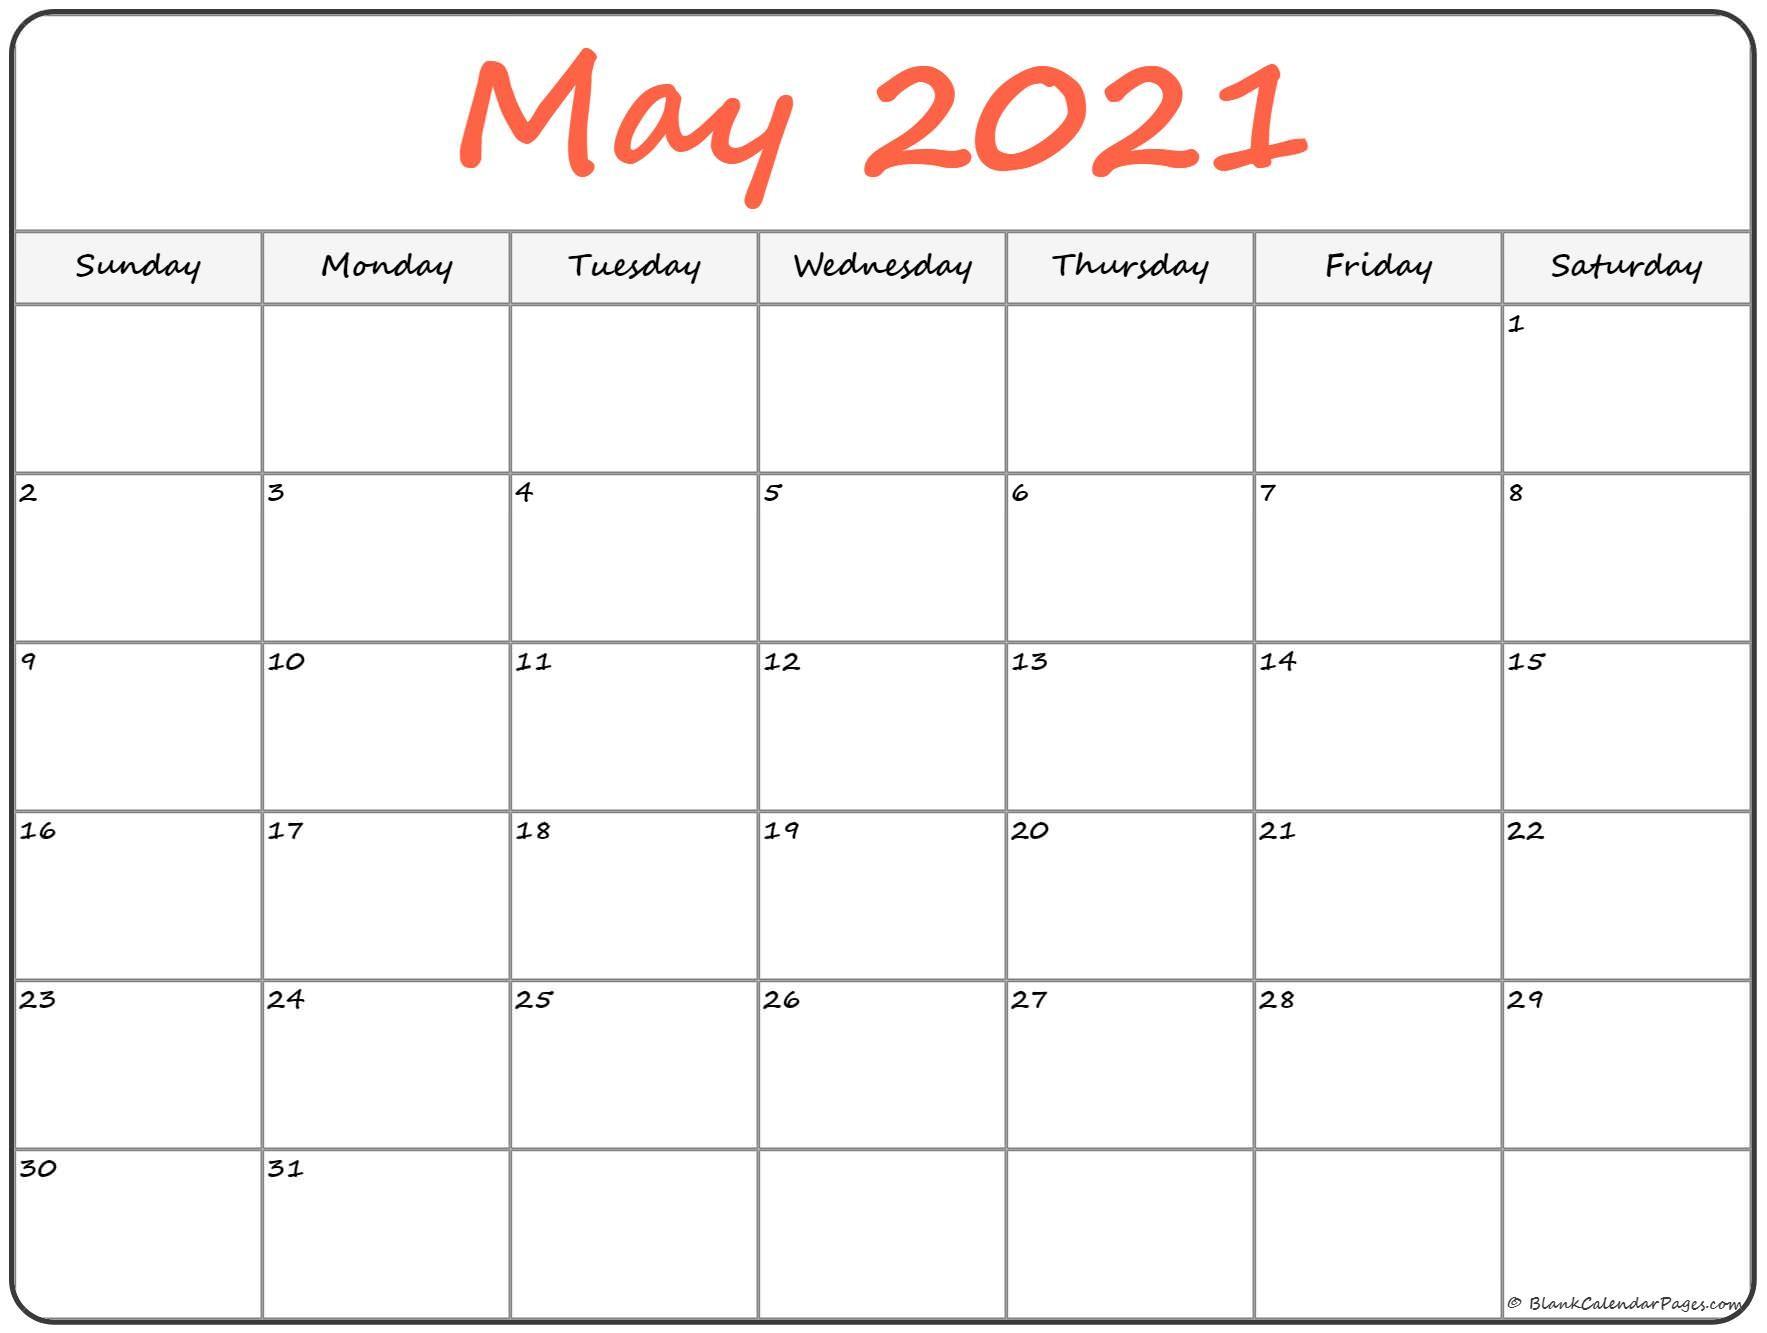 2021 Editable Calendar February March April May | Free With Regard To Printable Calendar March April May 2021